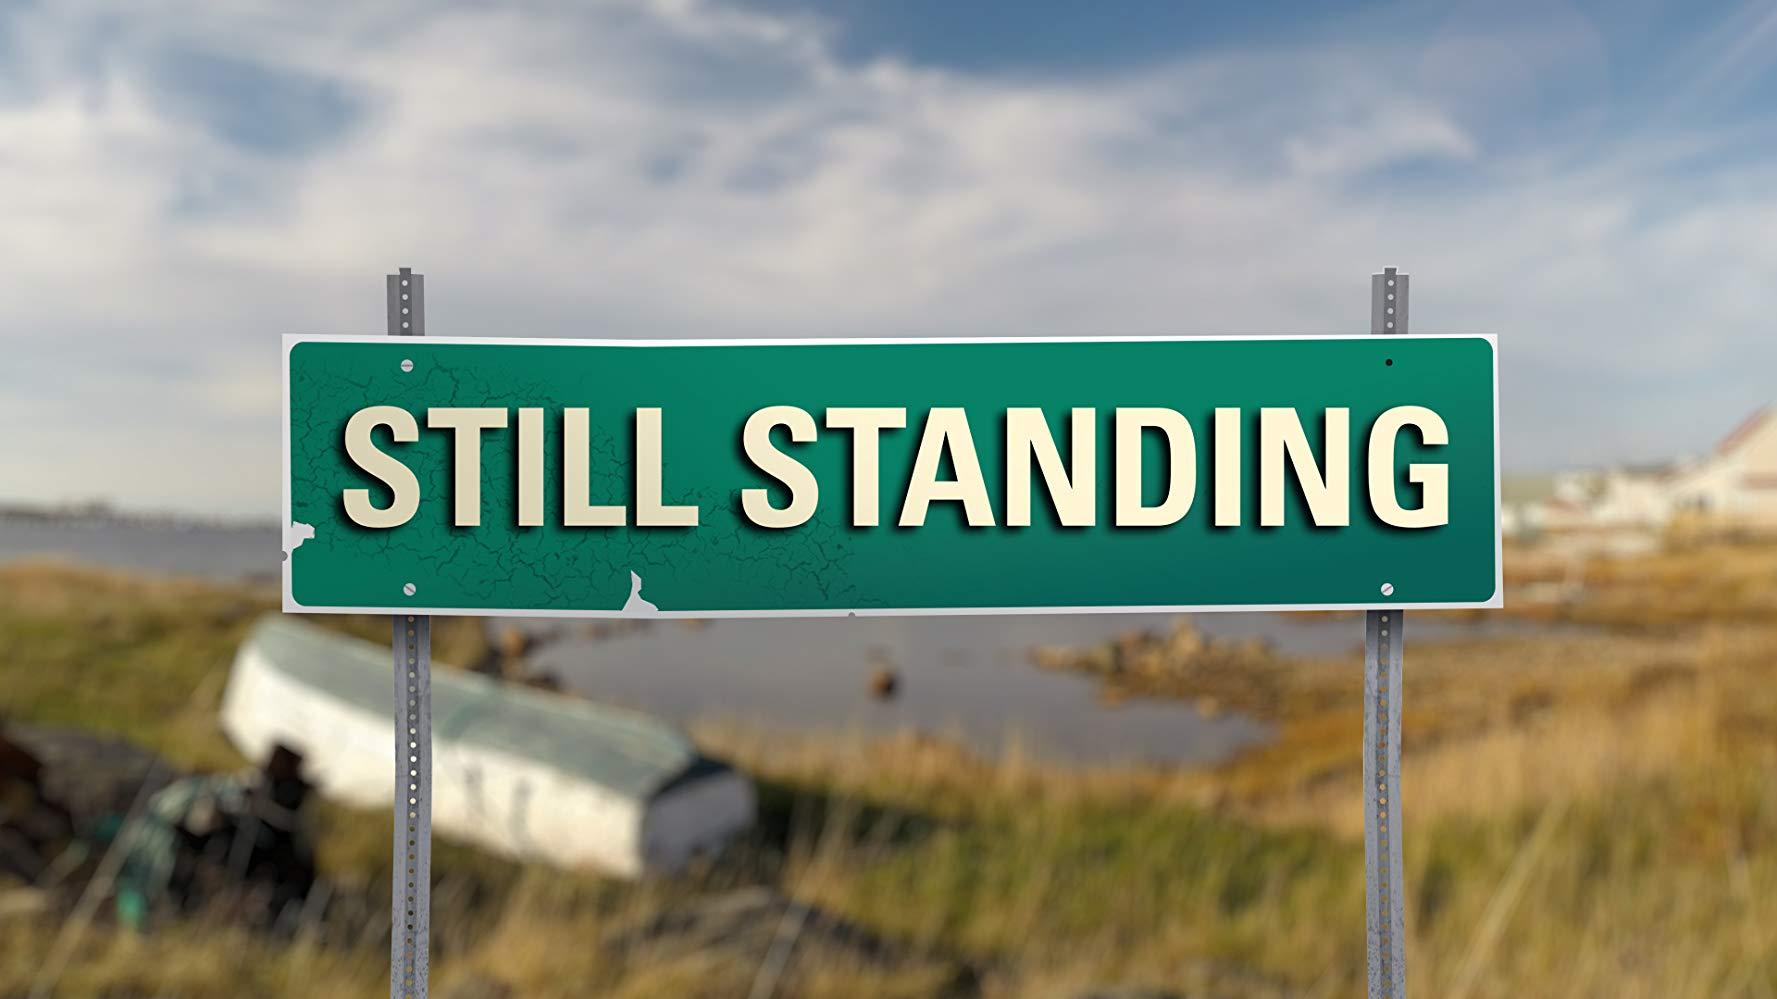 Still Standing 2015 S04E06 New Denmark 720p WEBRip x264-KOMPOST